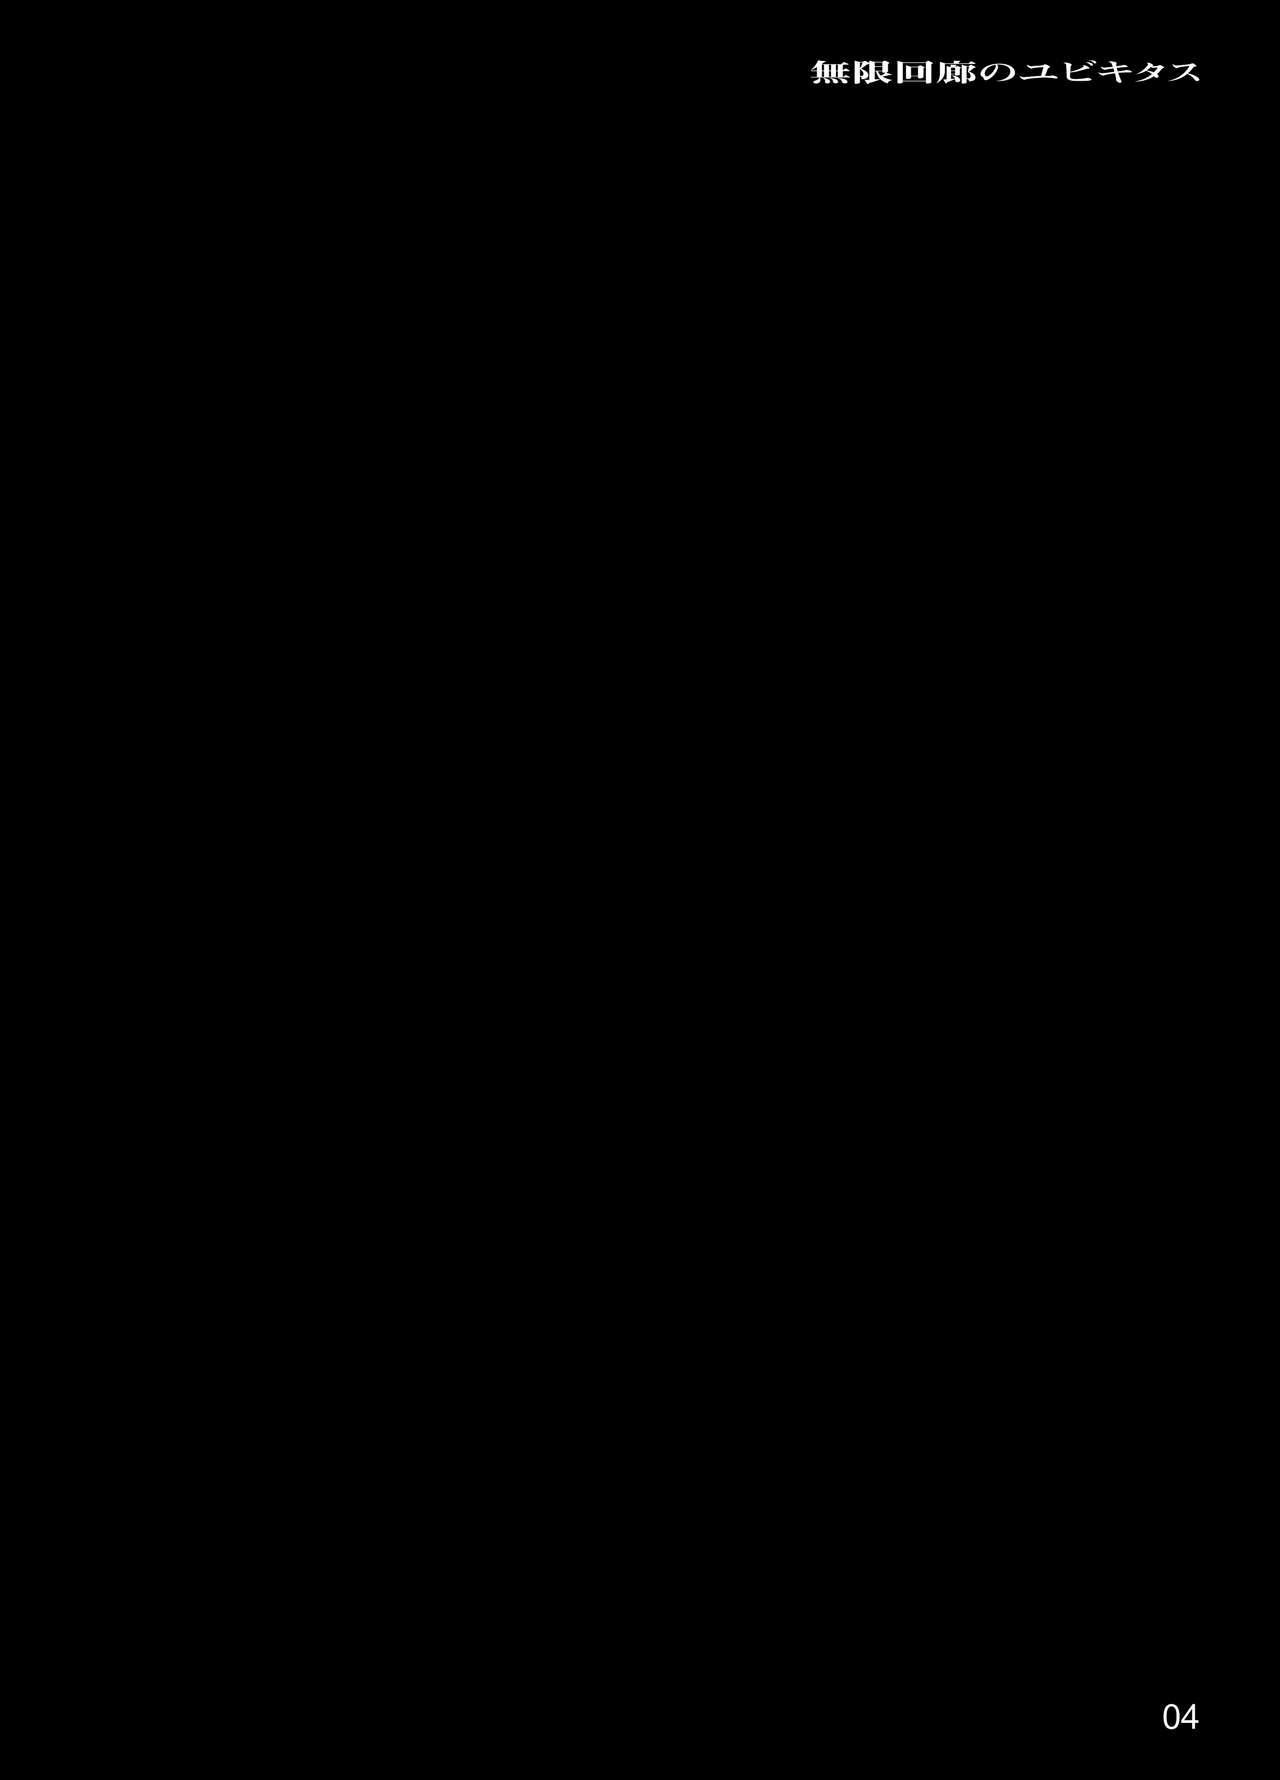 Mugen Kairou no Ubiquitous 3